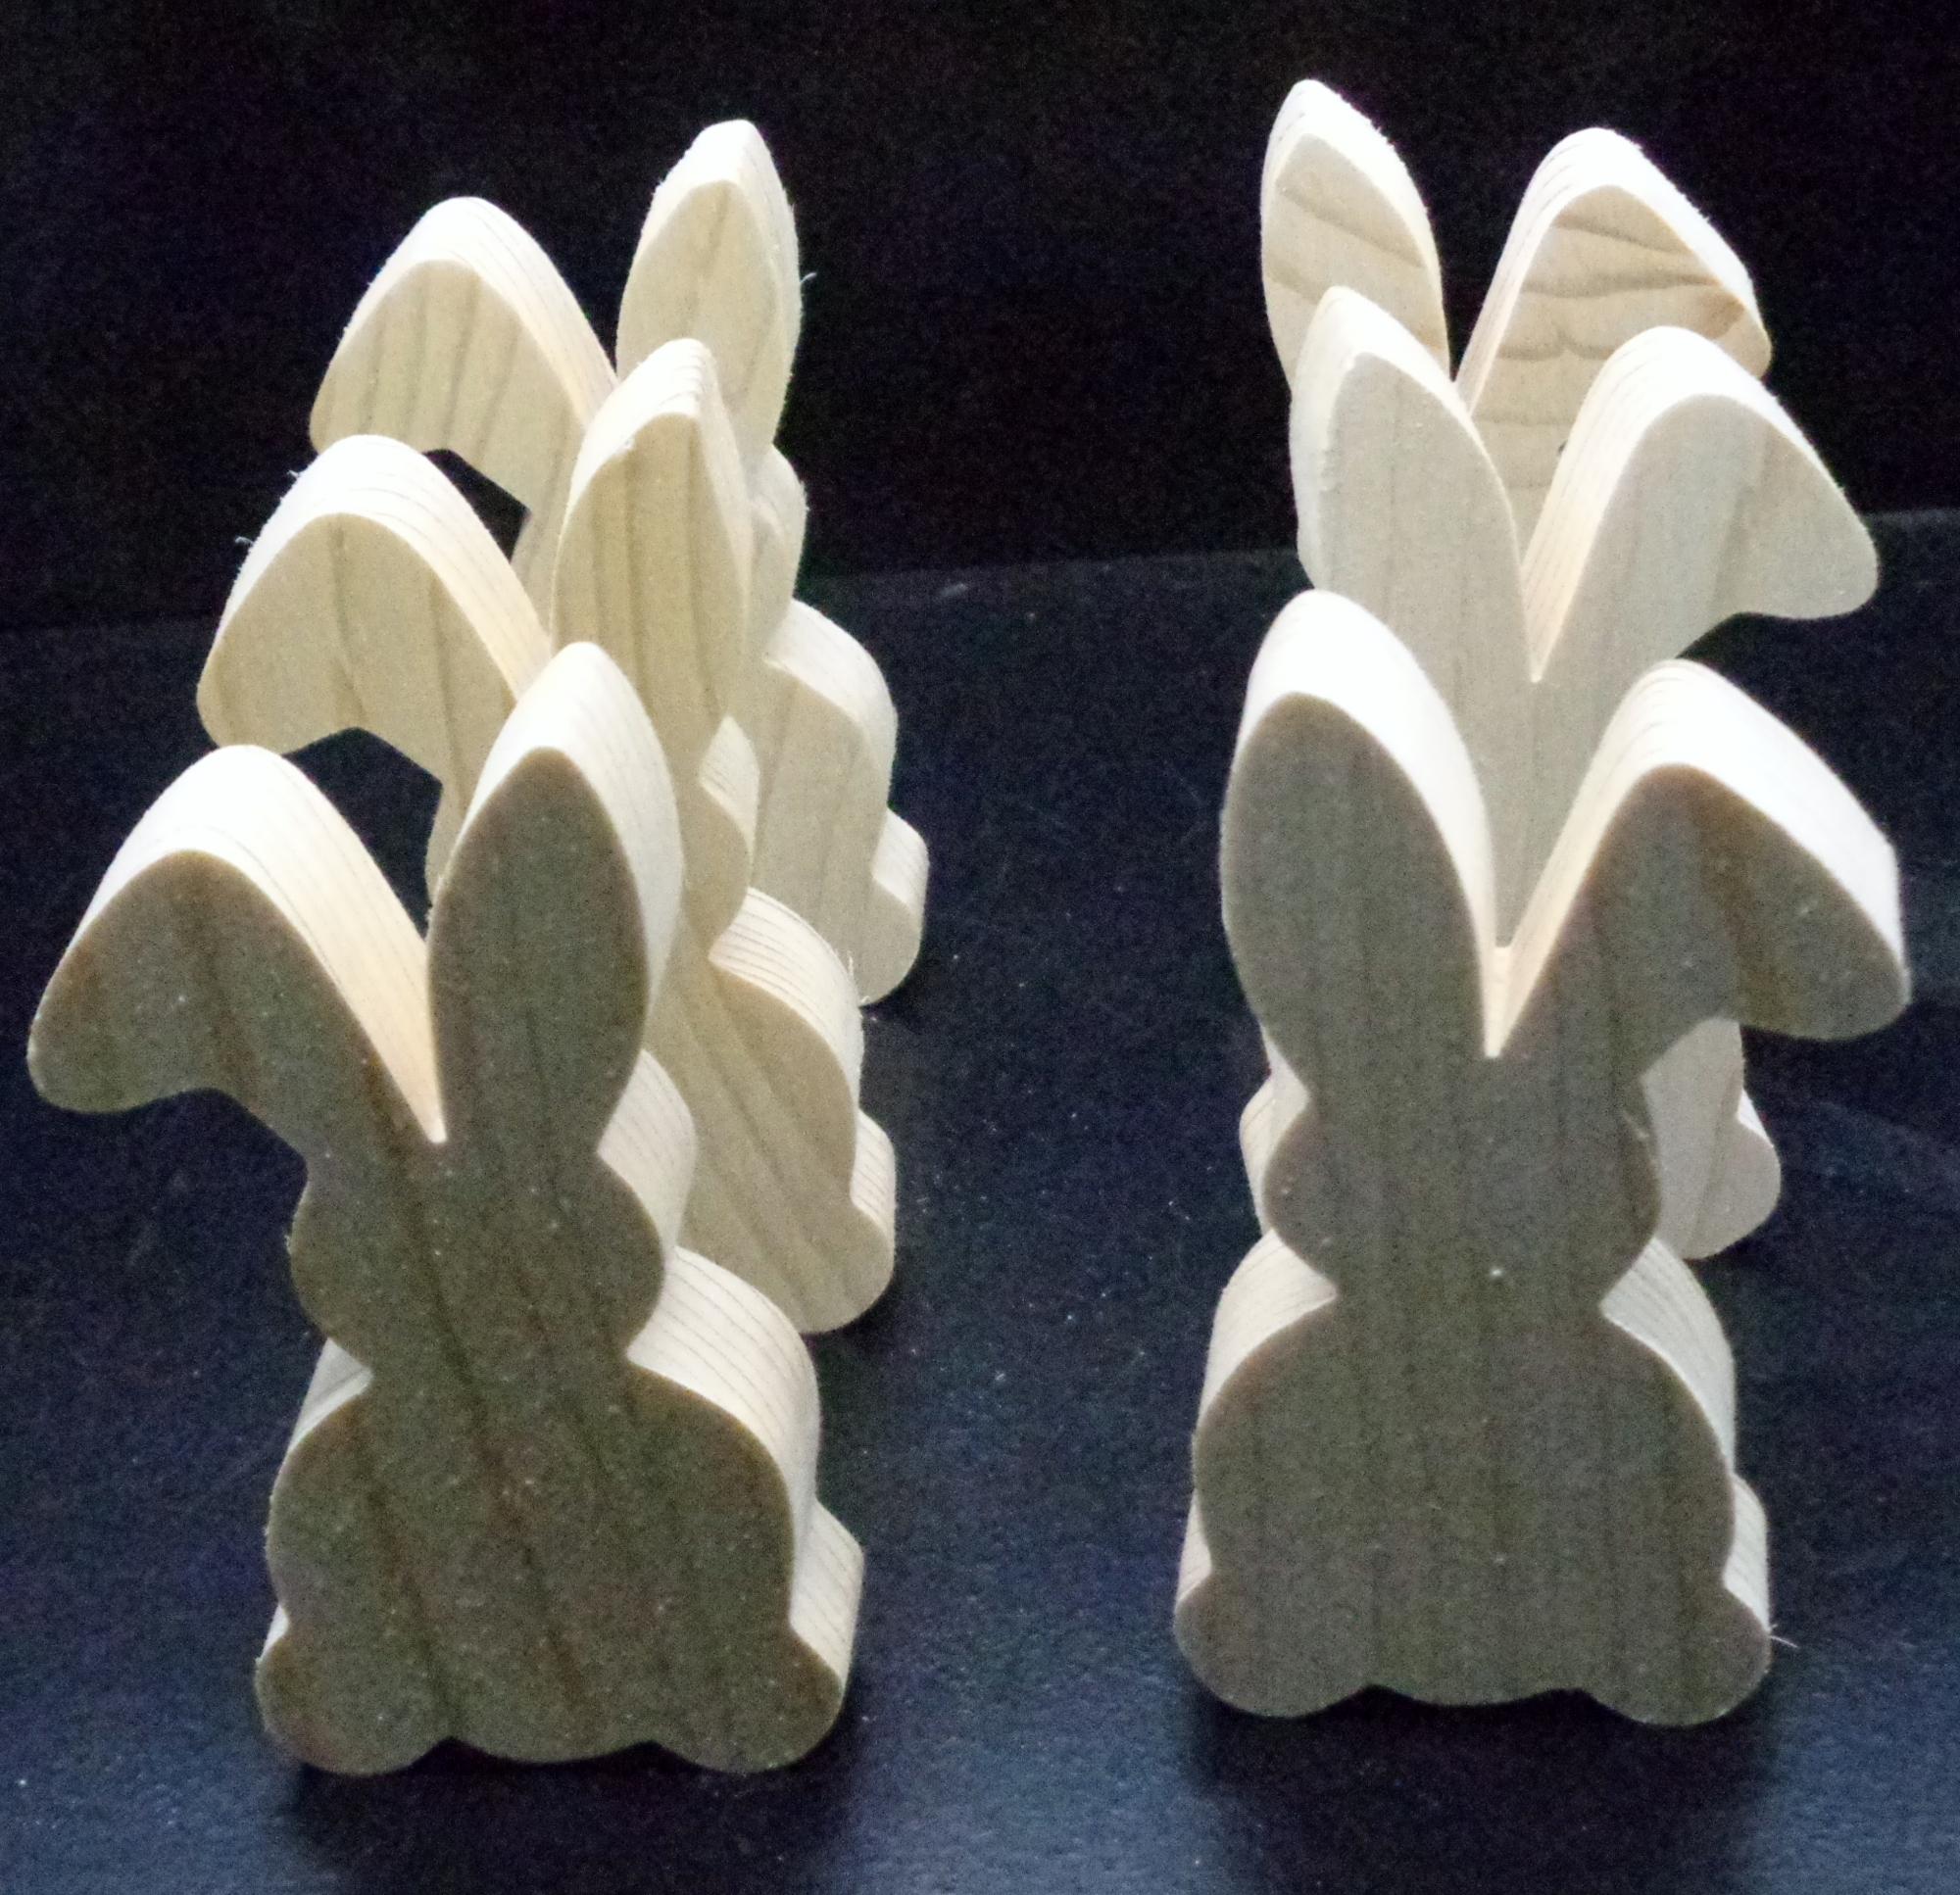 Pkg of 6 Rabbits    Unfinished  Wood Cutouts WCO-89-75